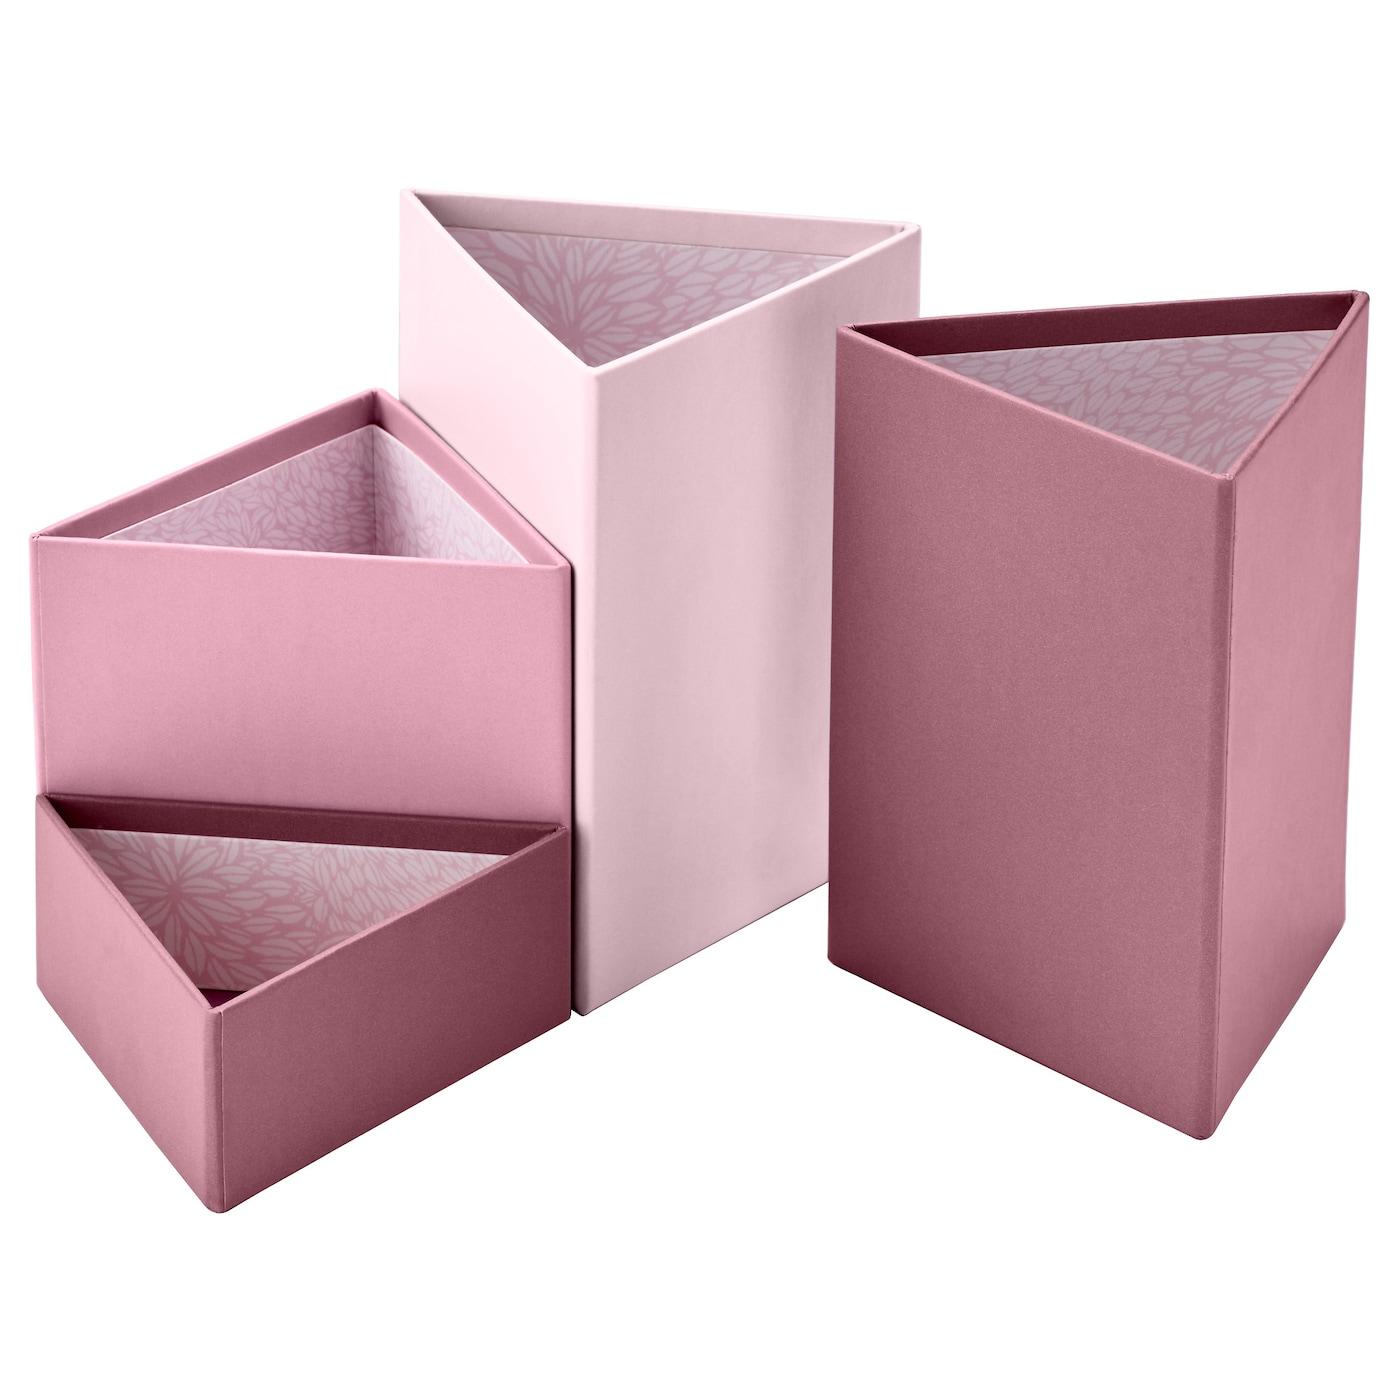 eklog pot crayons lot de 4 rose ikea. Black Bedroom Furniture Sets. Home Design Ideas